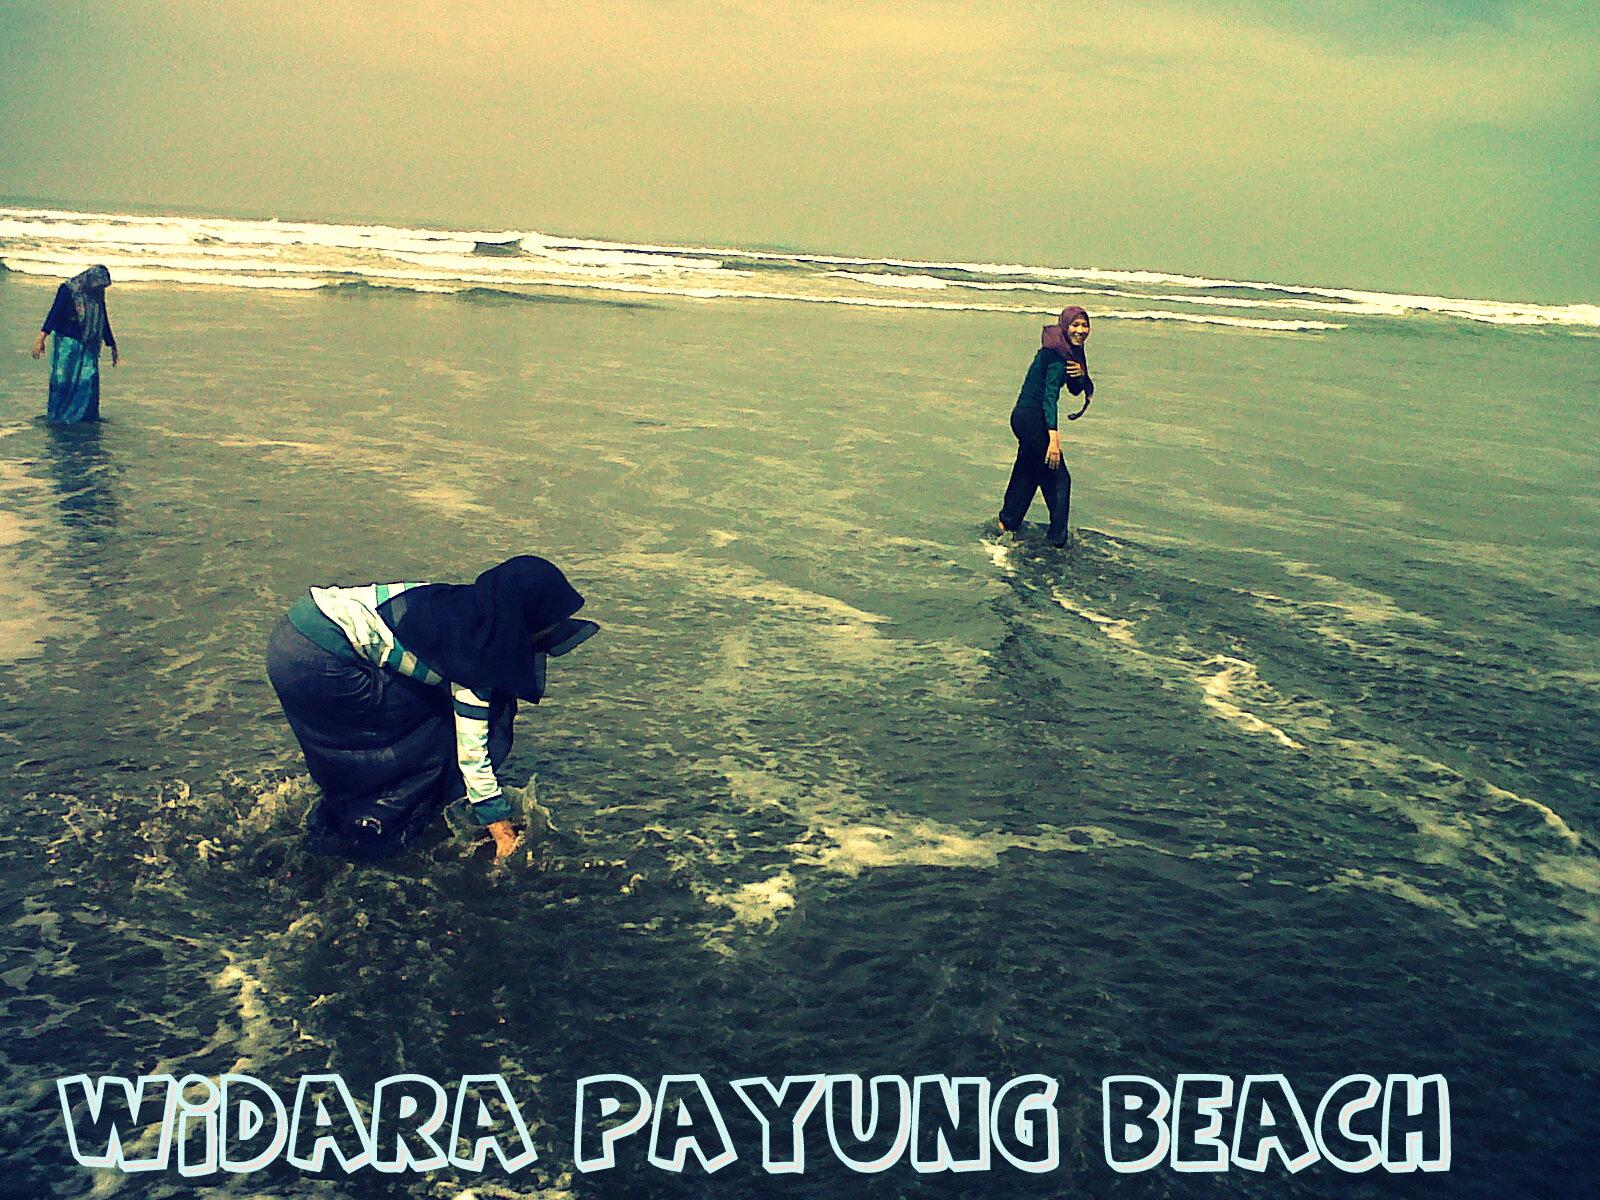 Asiknya Berwisata Murah Pantai Widara Payung Banyumas Maszal Wp Beach